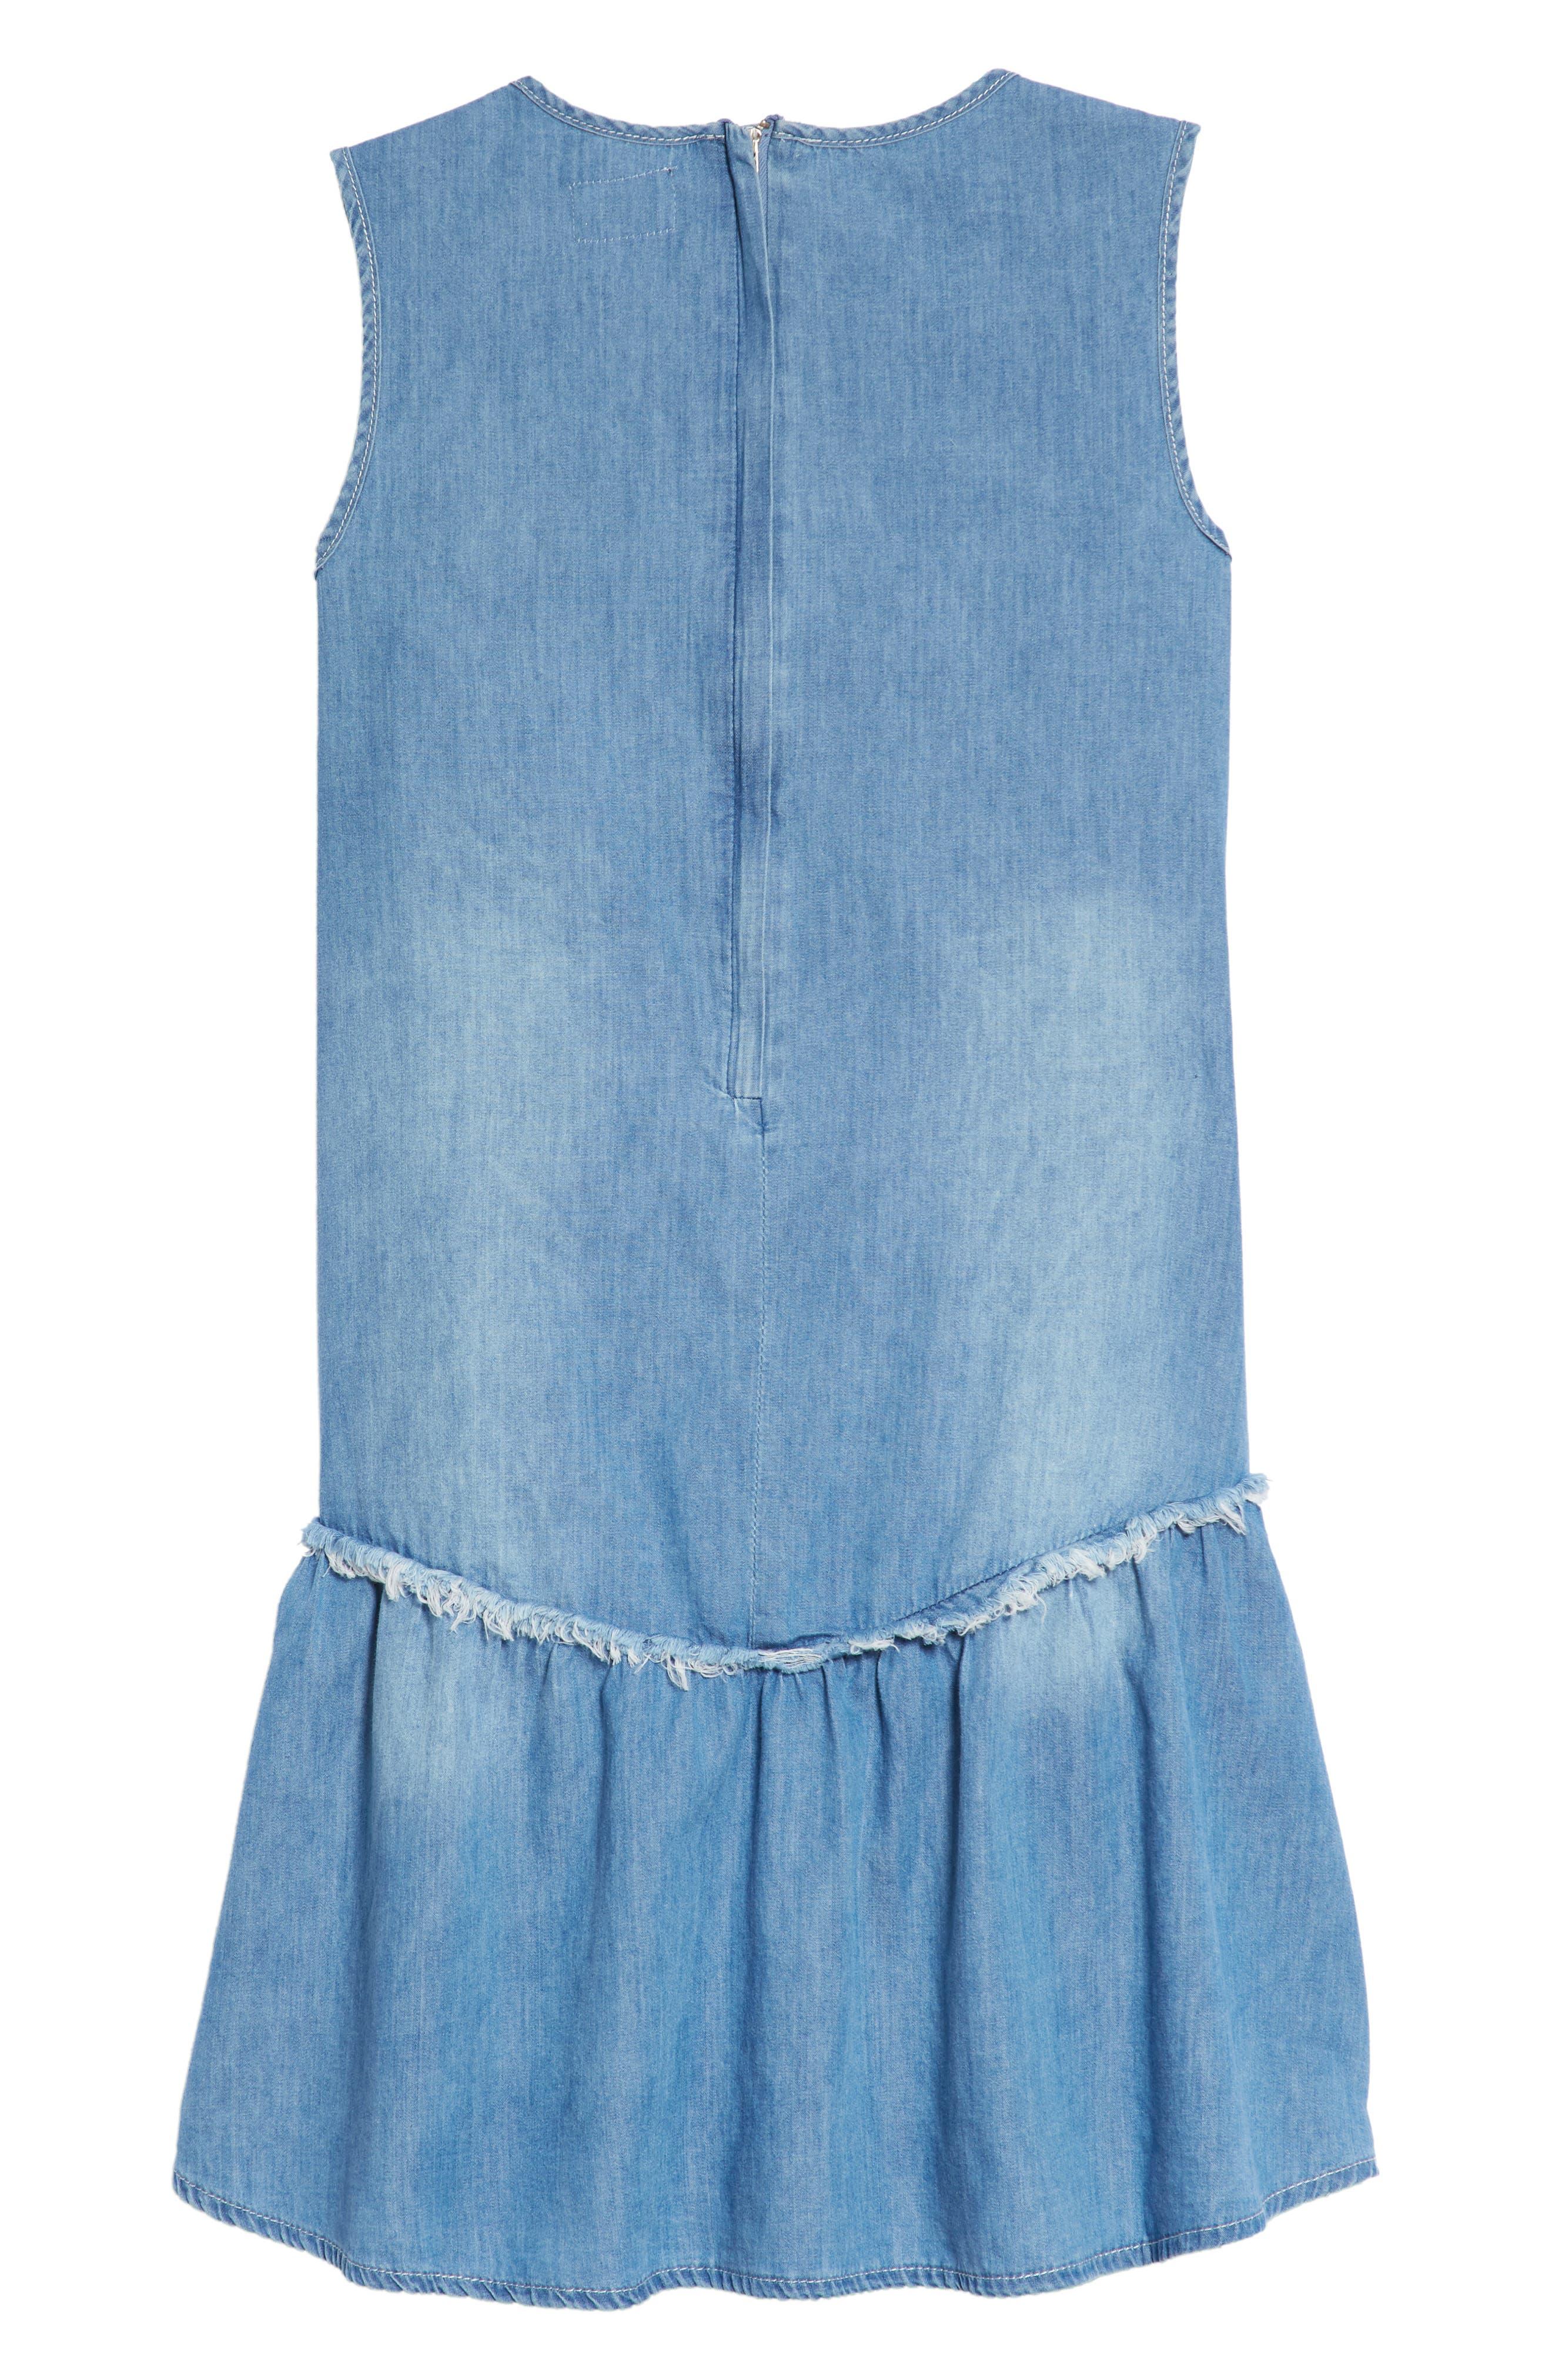 Lulu Lace-Up Chambray Dress,                             Alternate thumbnail 2, color,                             400